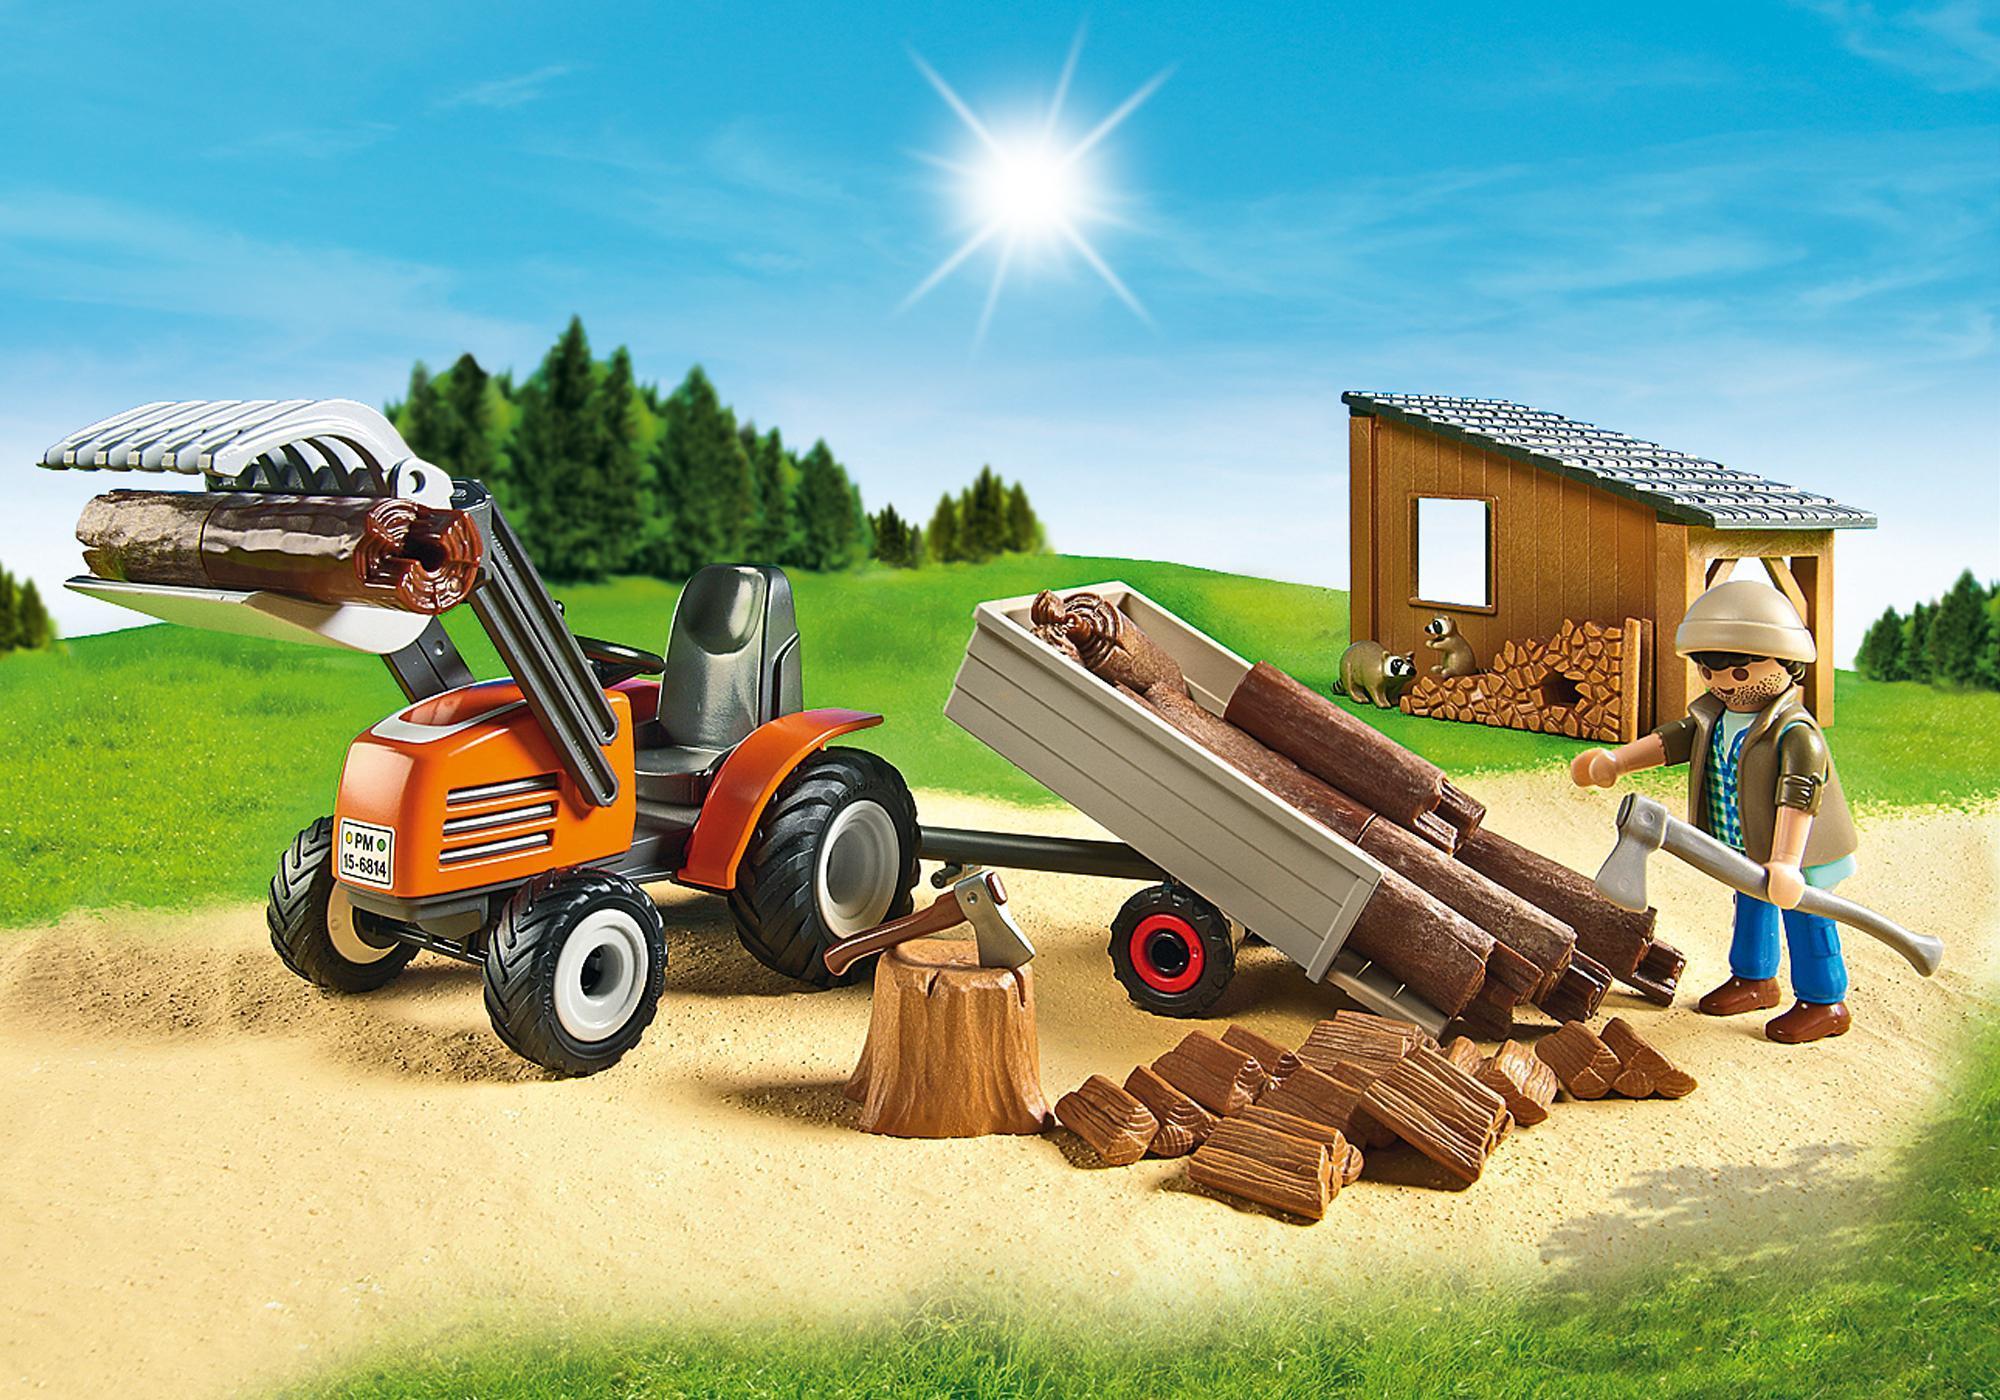 http://media.playmobil.com/i/playmobil/6814_product_extra1/Houthakker met tractor